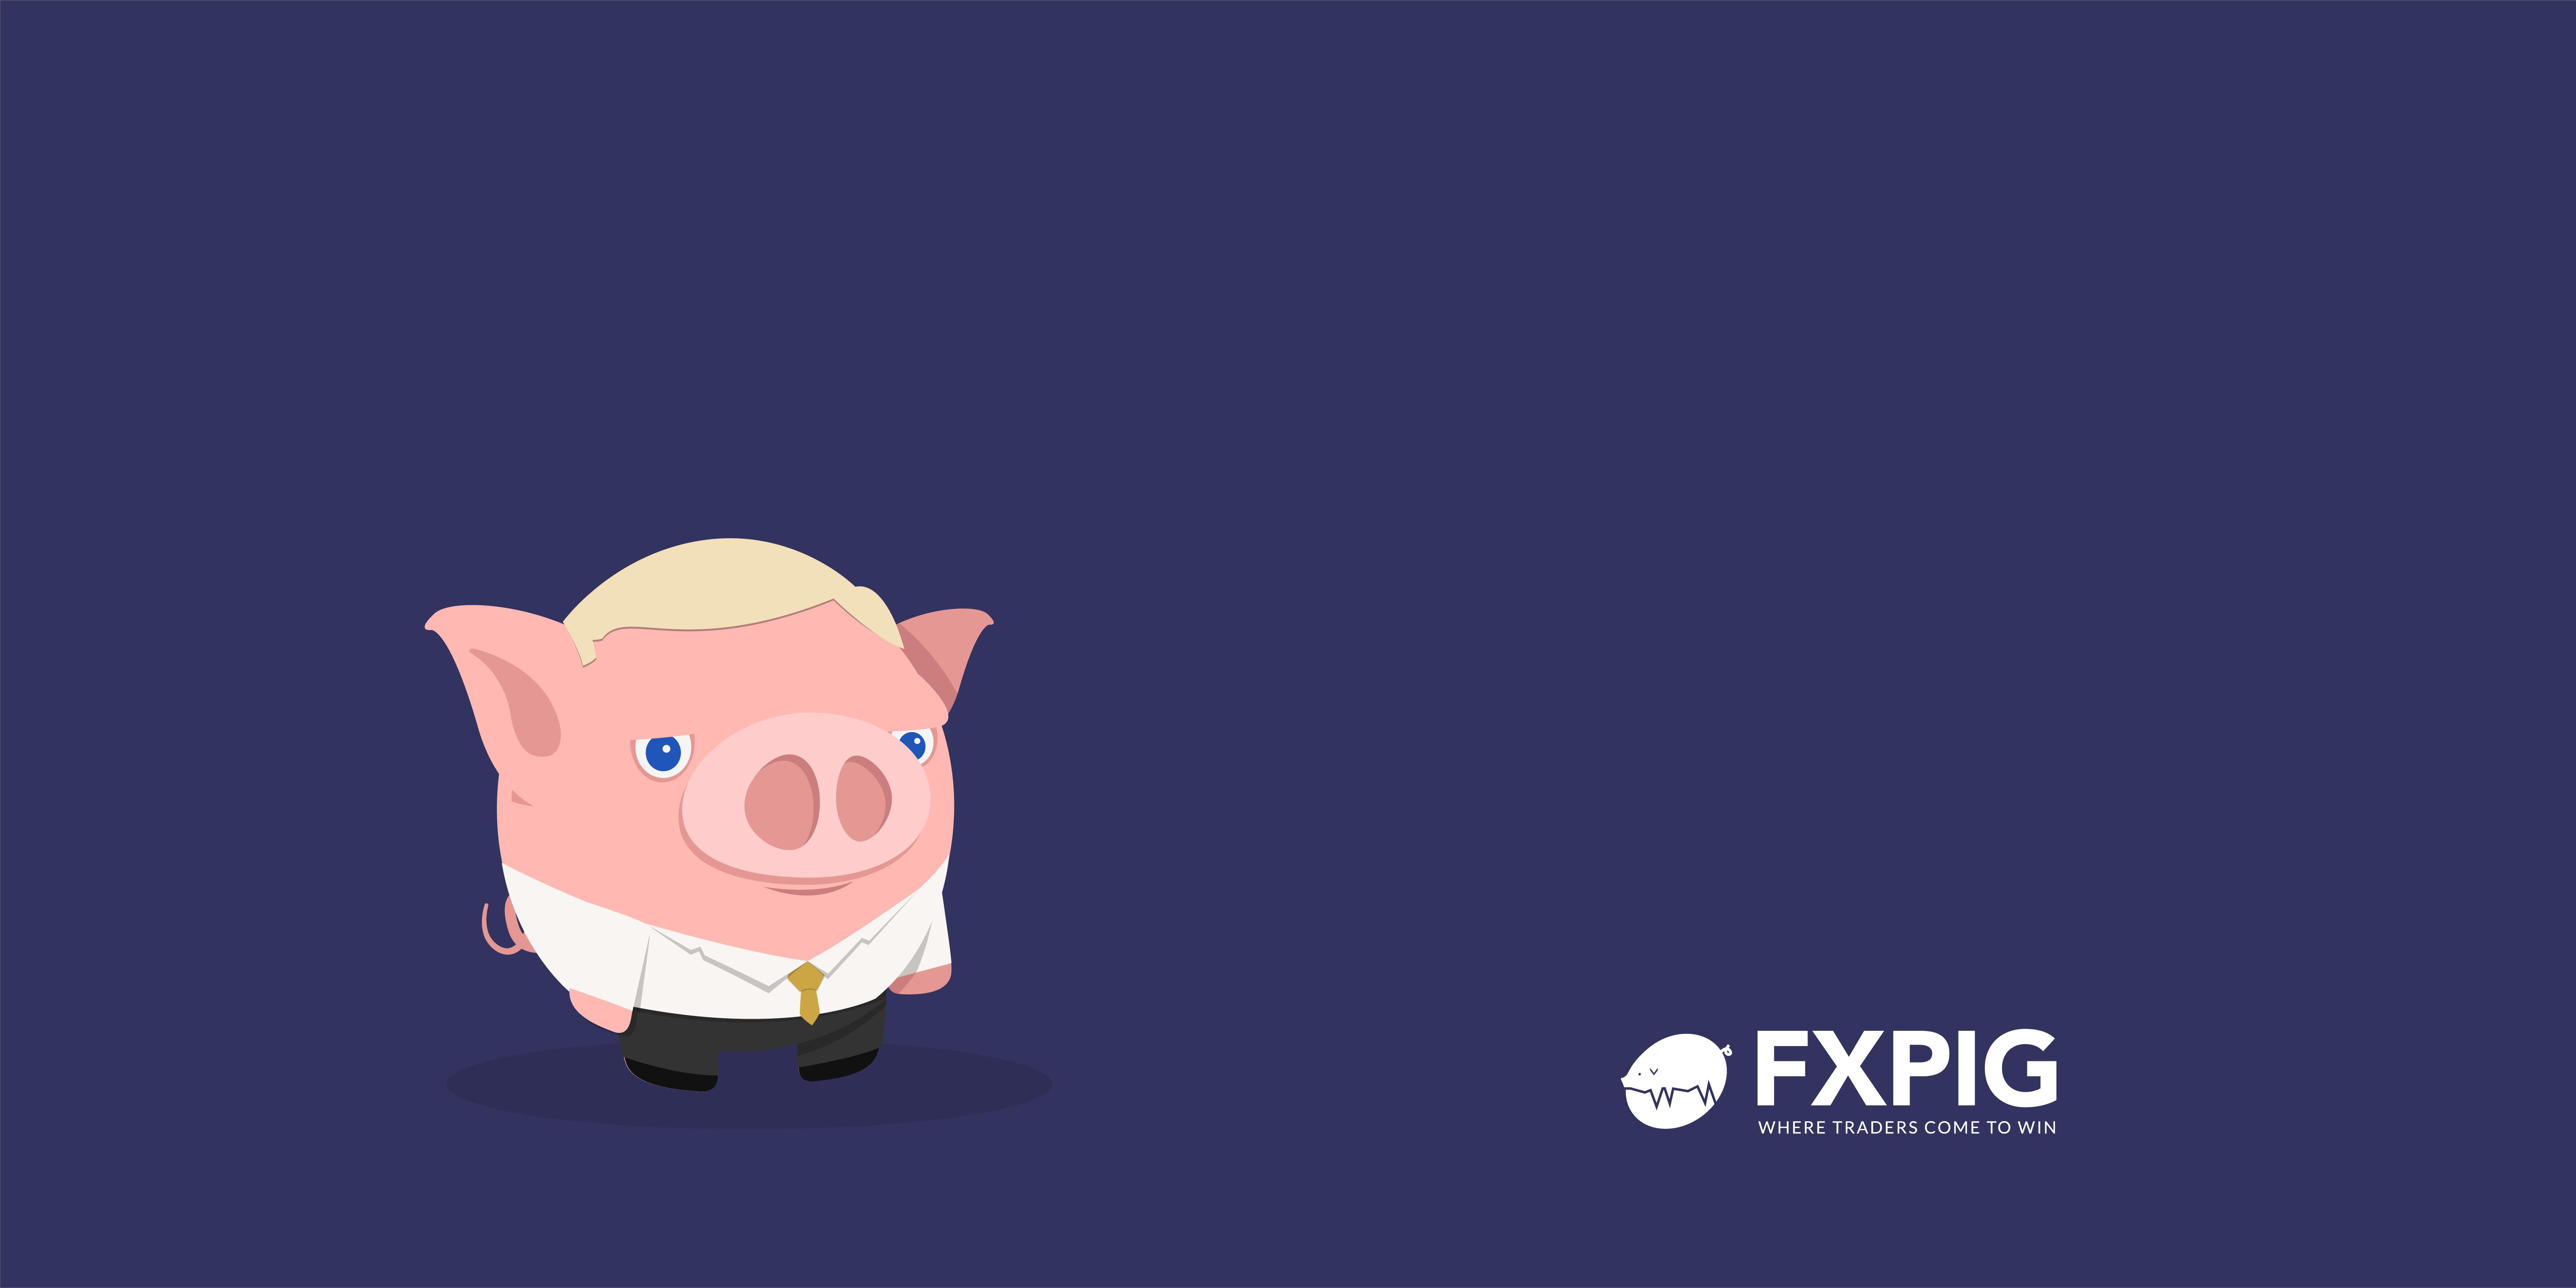 FOREX-Trading-wisdom_Seykota_FXPIG